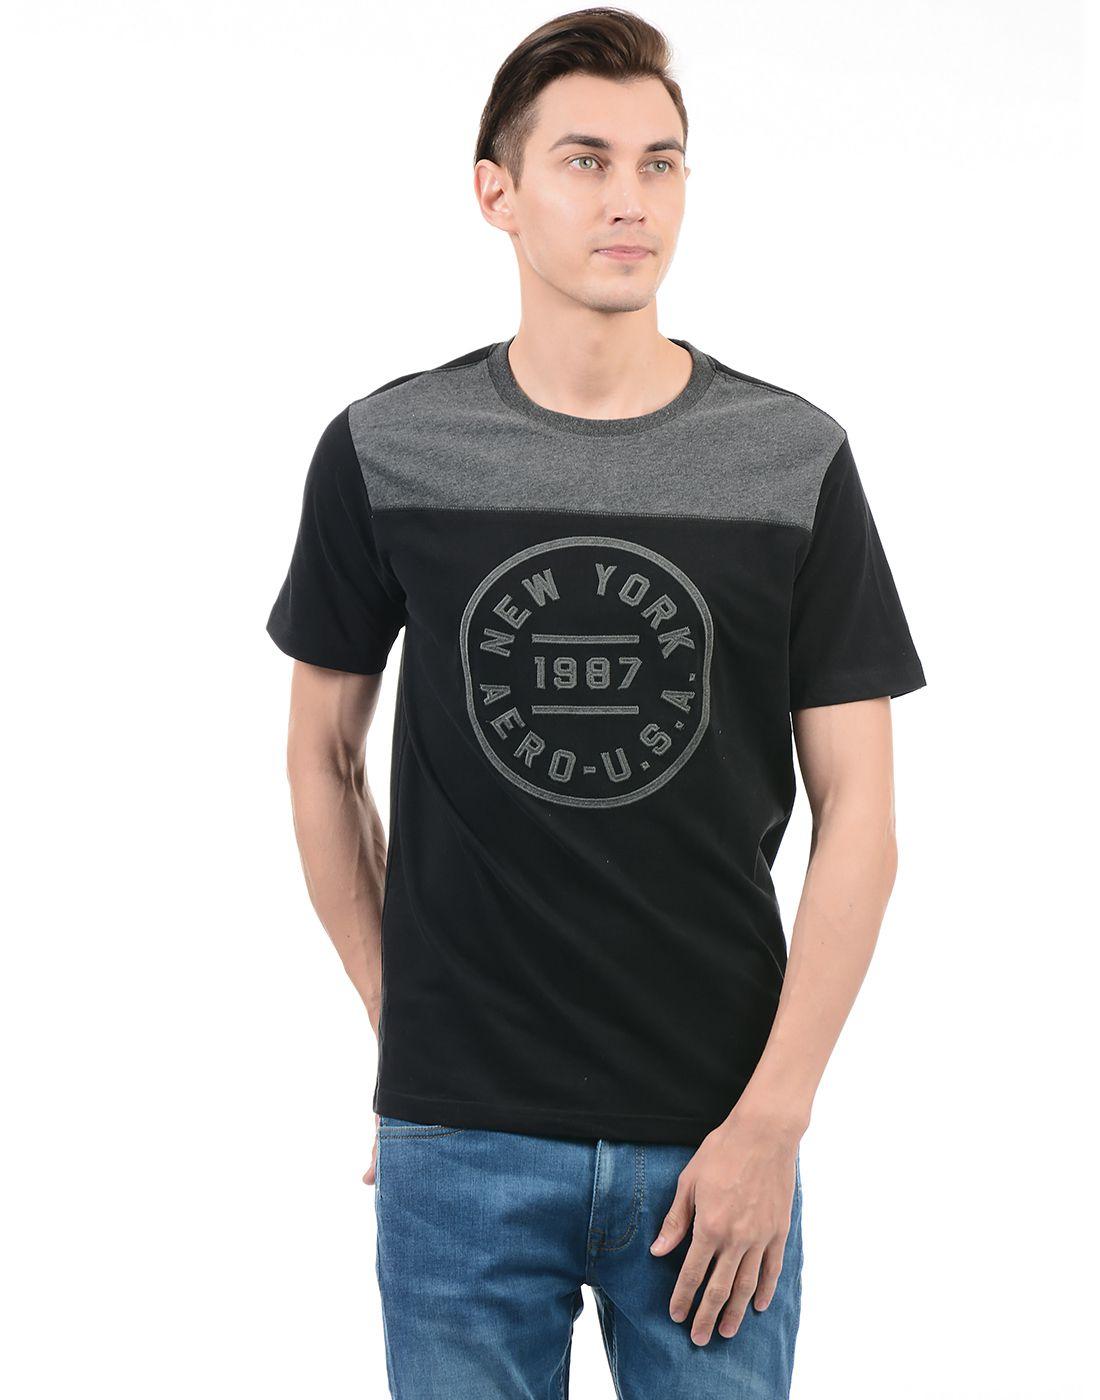 Aeropostale Black Round T-Shirt